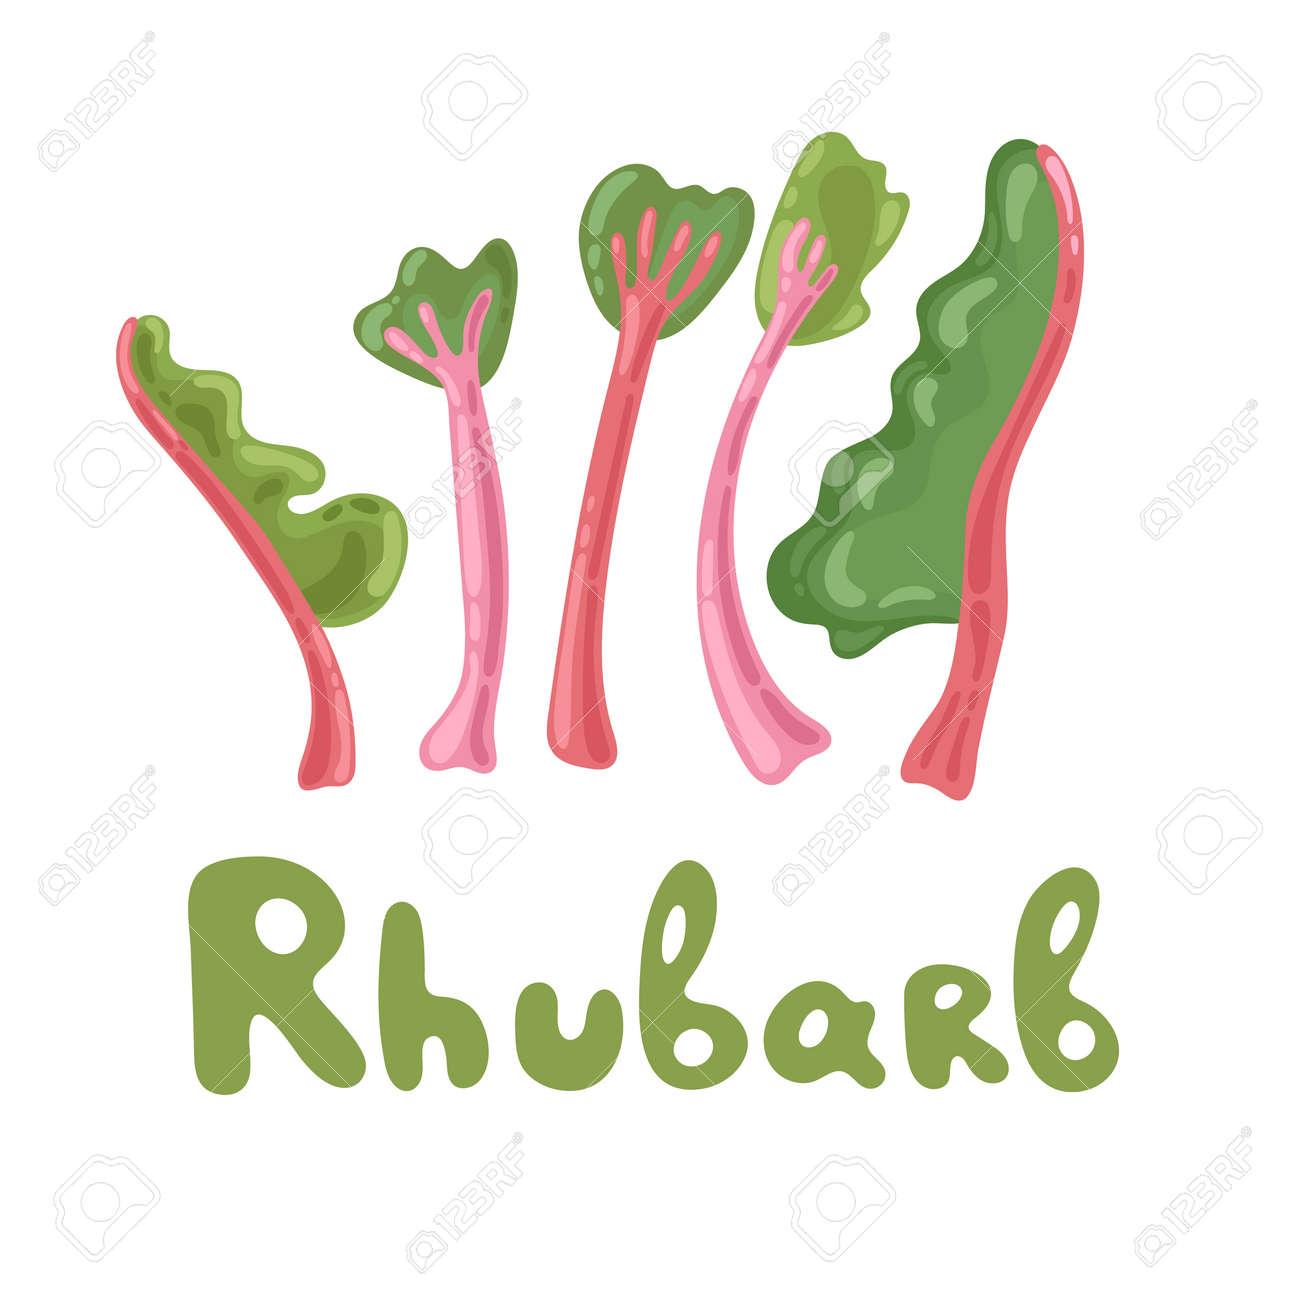 Rhubarb vector set isolated - 151366500